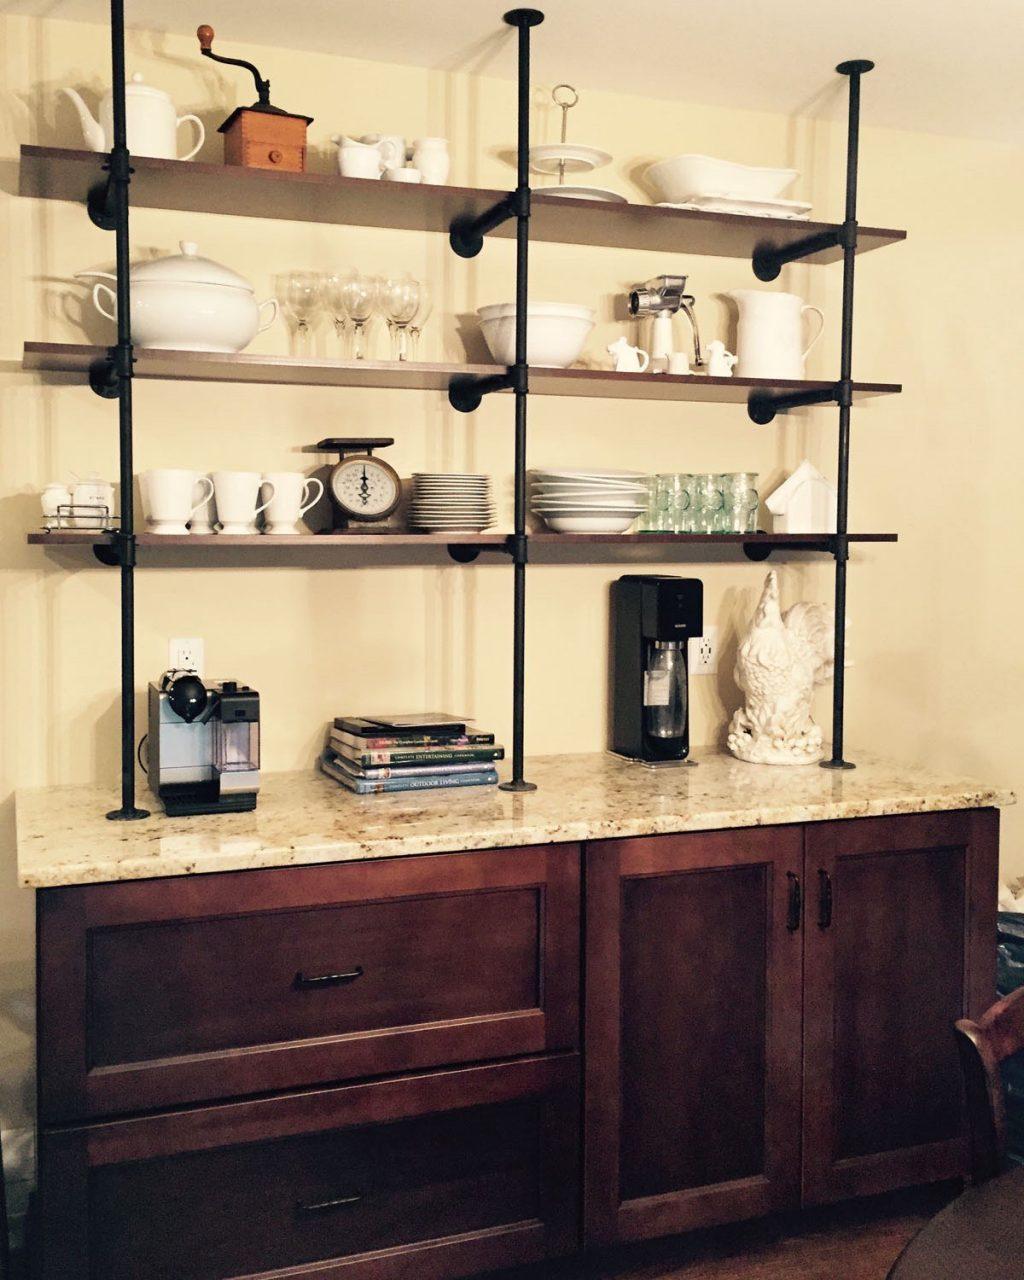 white kitchen cabinets nj kitchen cabinets Custom Cabinets Ramsey NJ